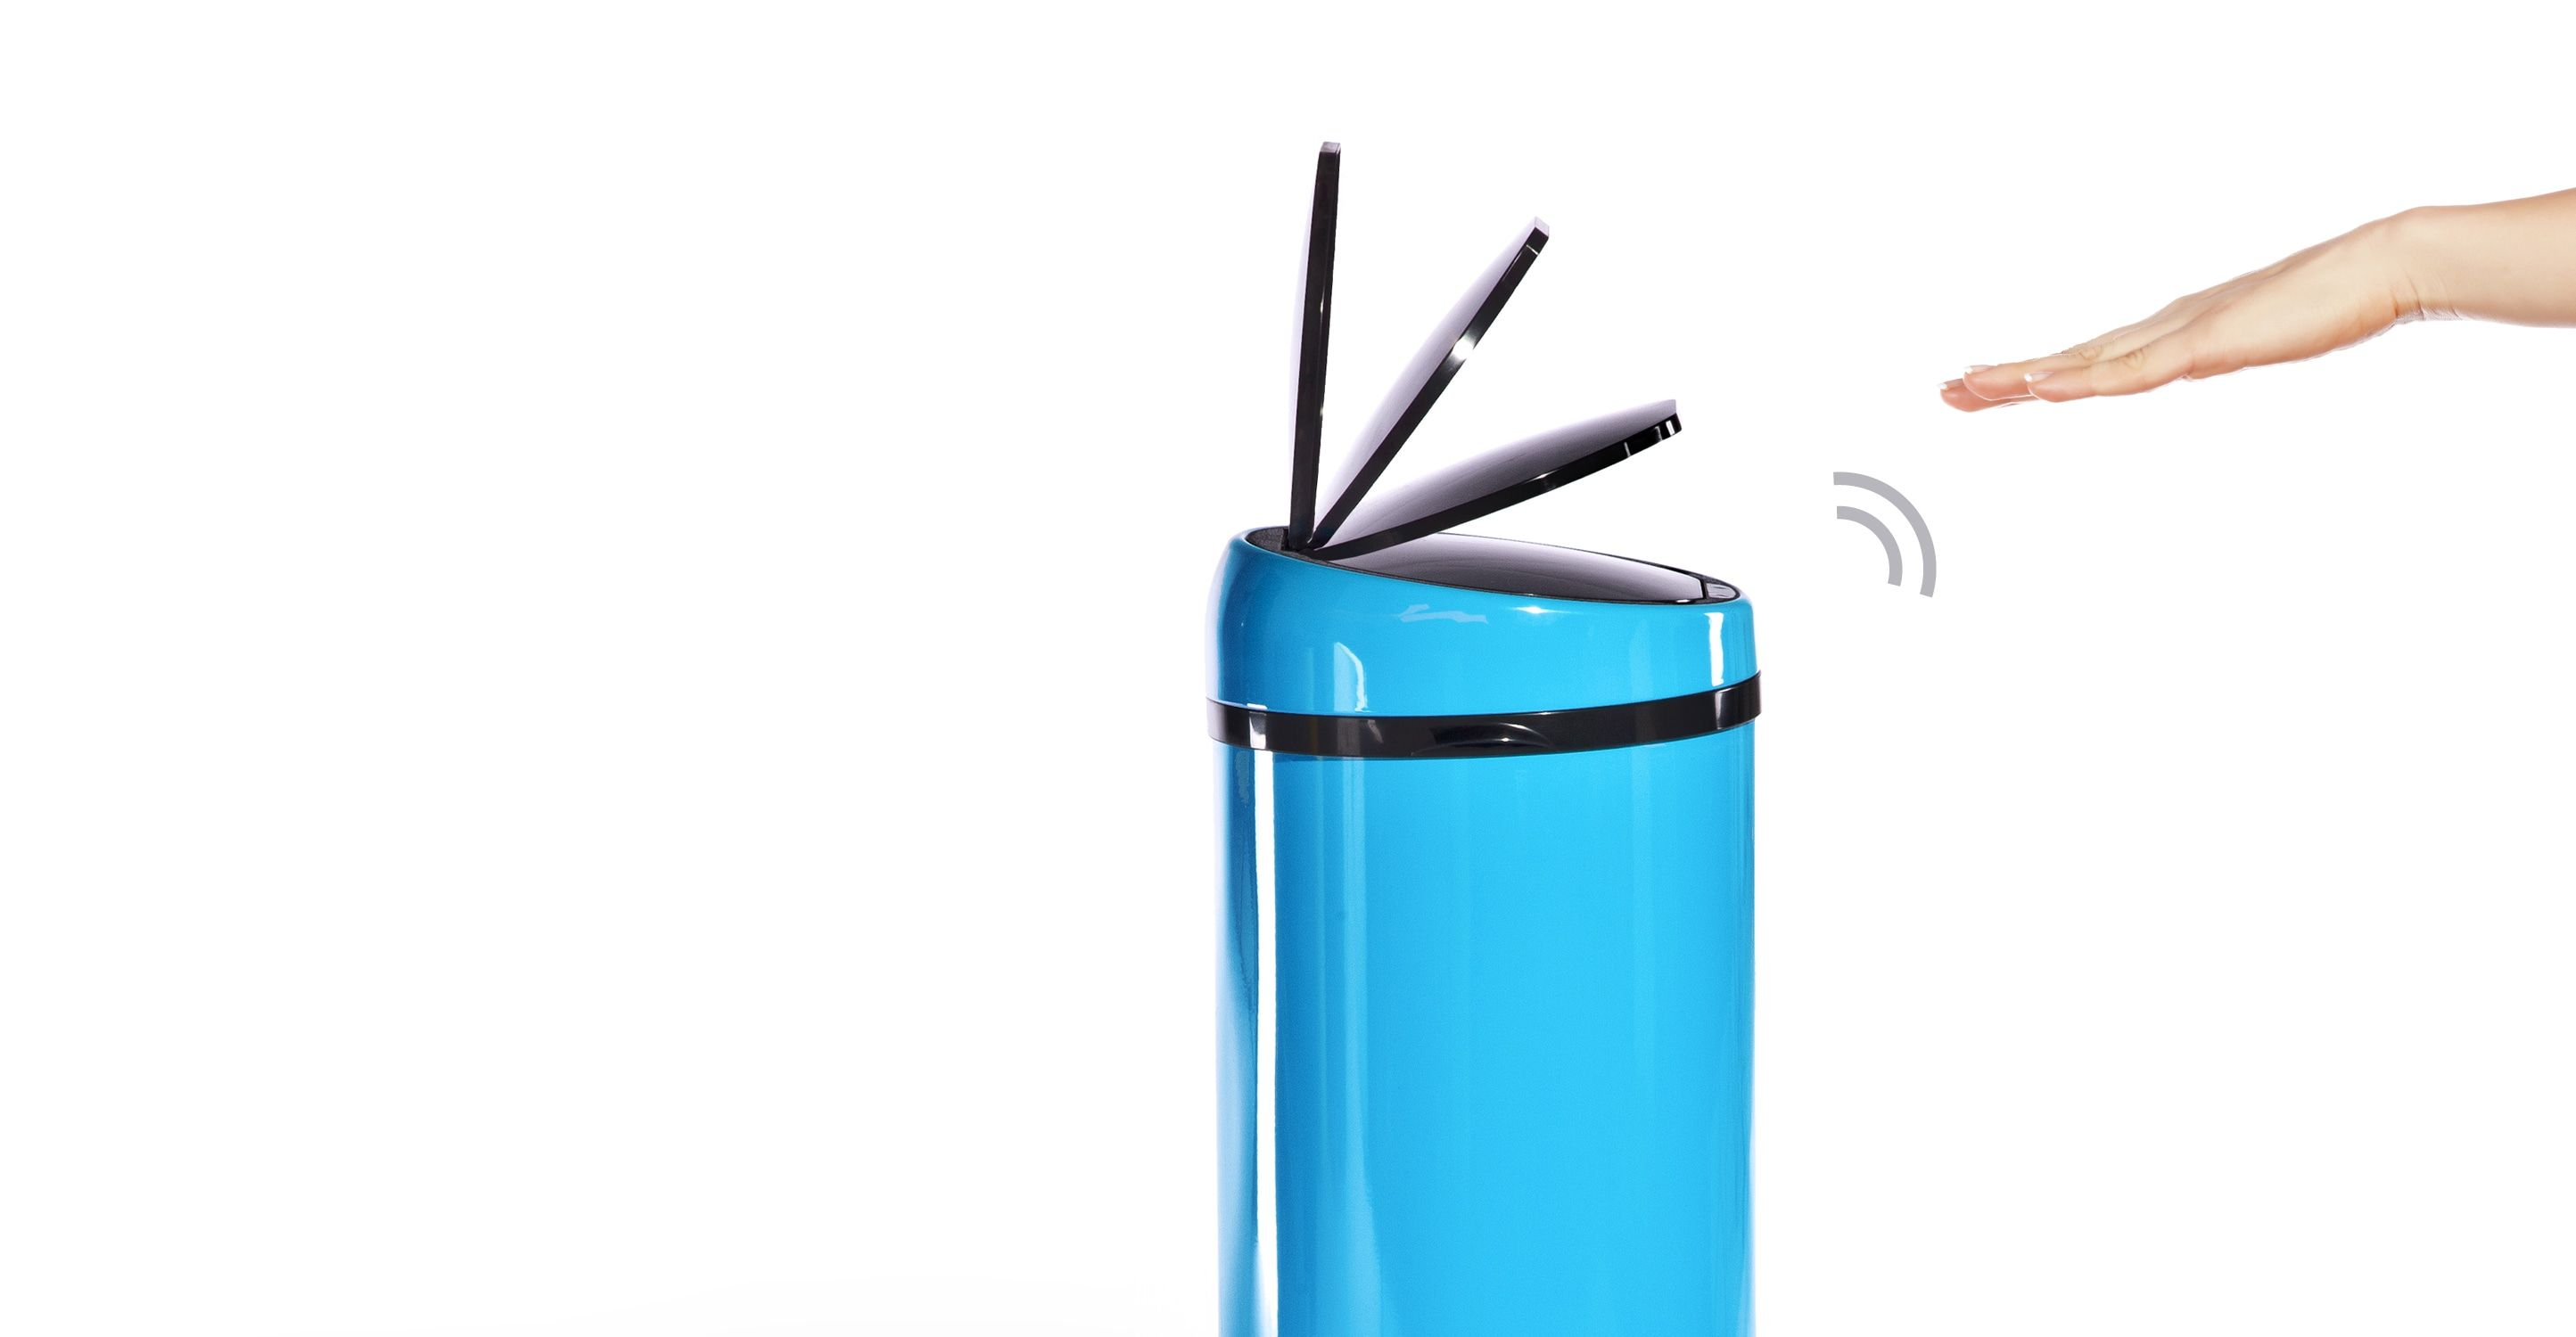 Modern Mülleimer Sensé Automatisch öffnender Eimer 50 L Blau